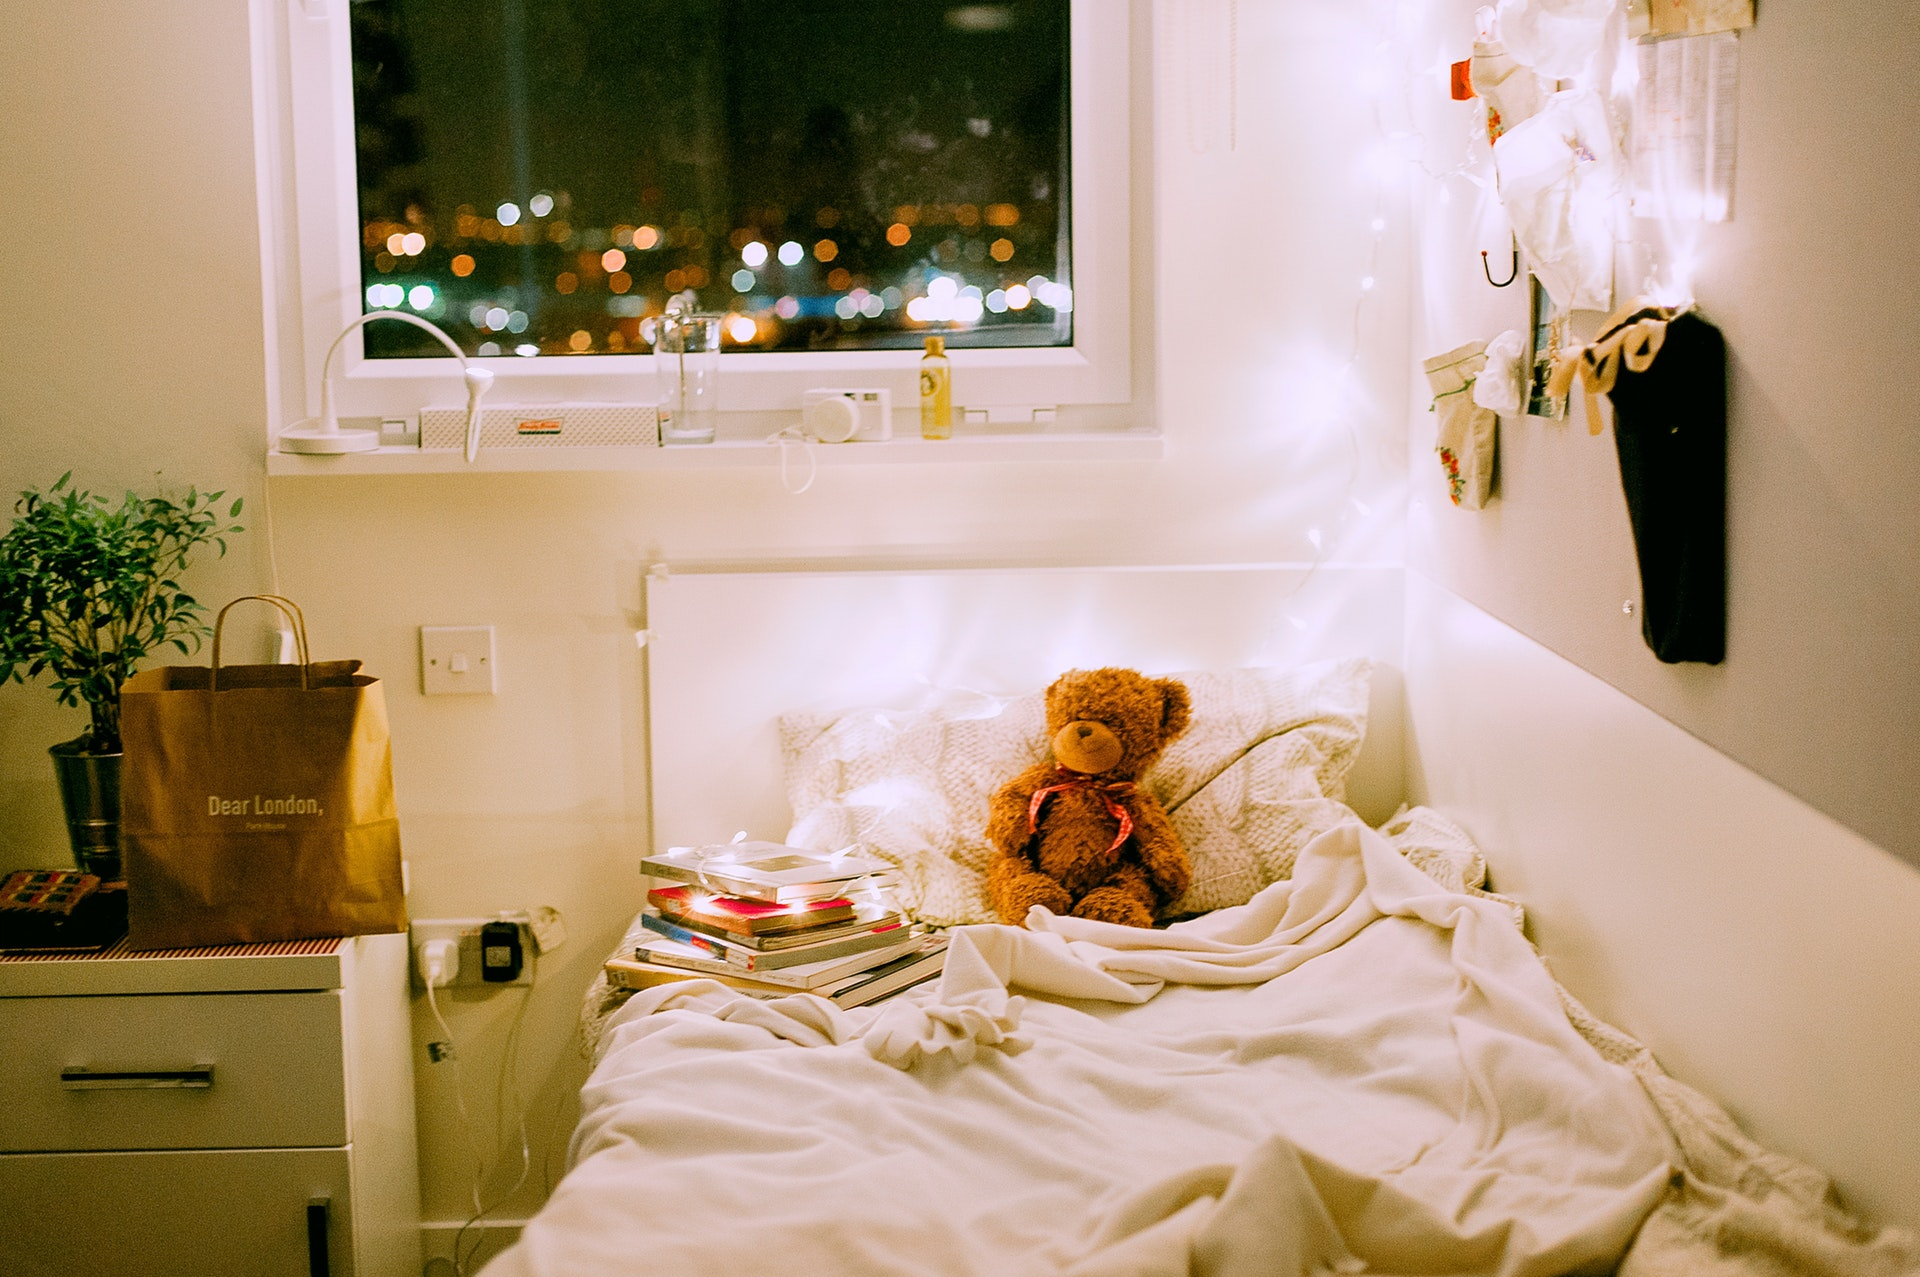 3 Year Old Sleep Regression – Changing Sleep Patterns